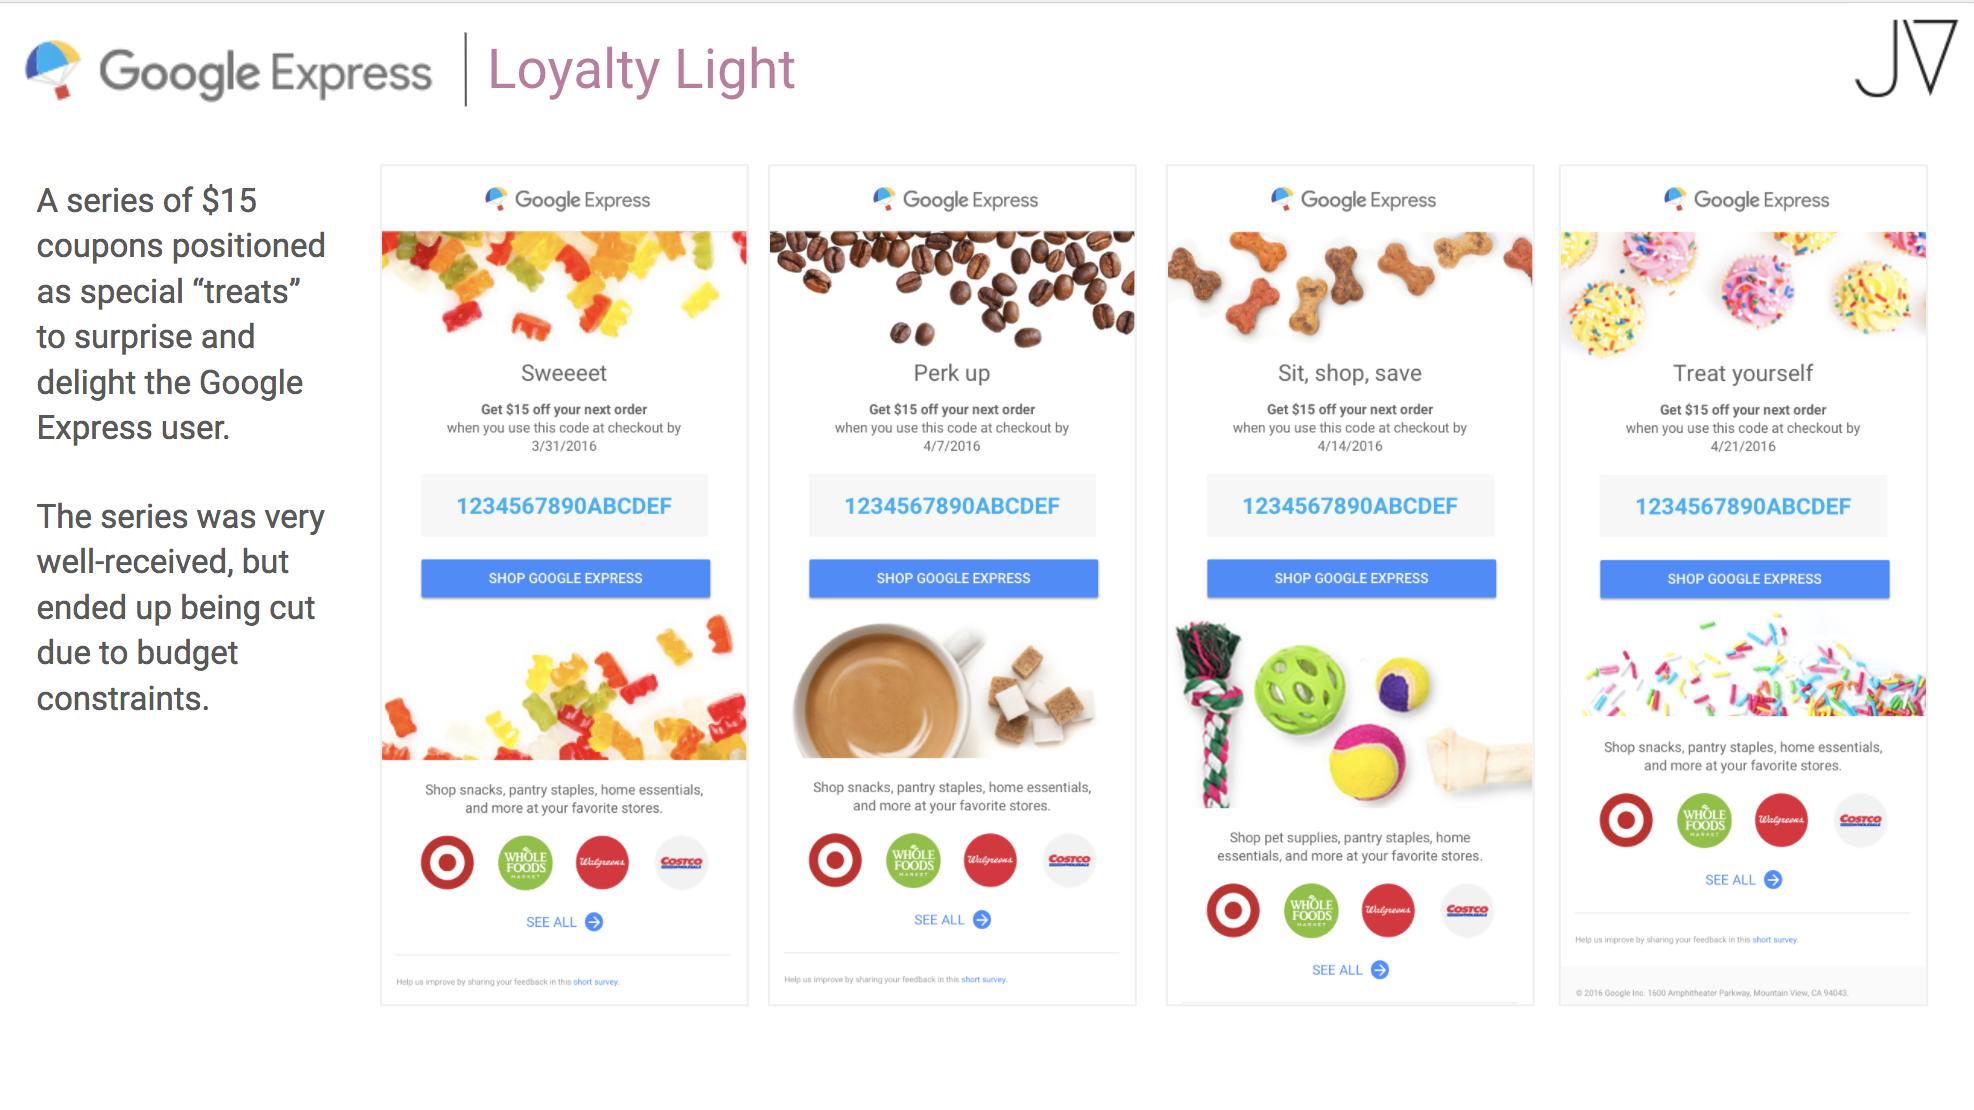 Google Express_Loyalty Light_Epsilon_updated.png